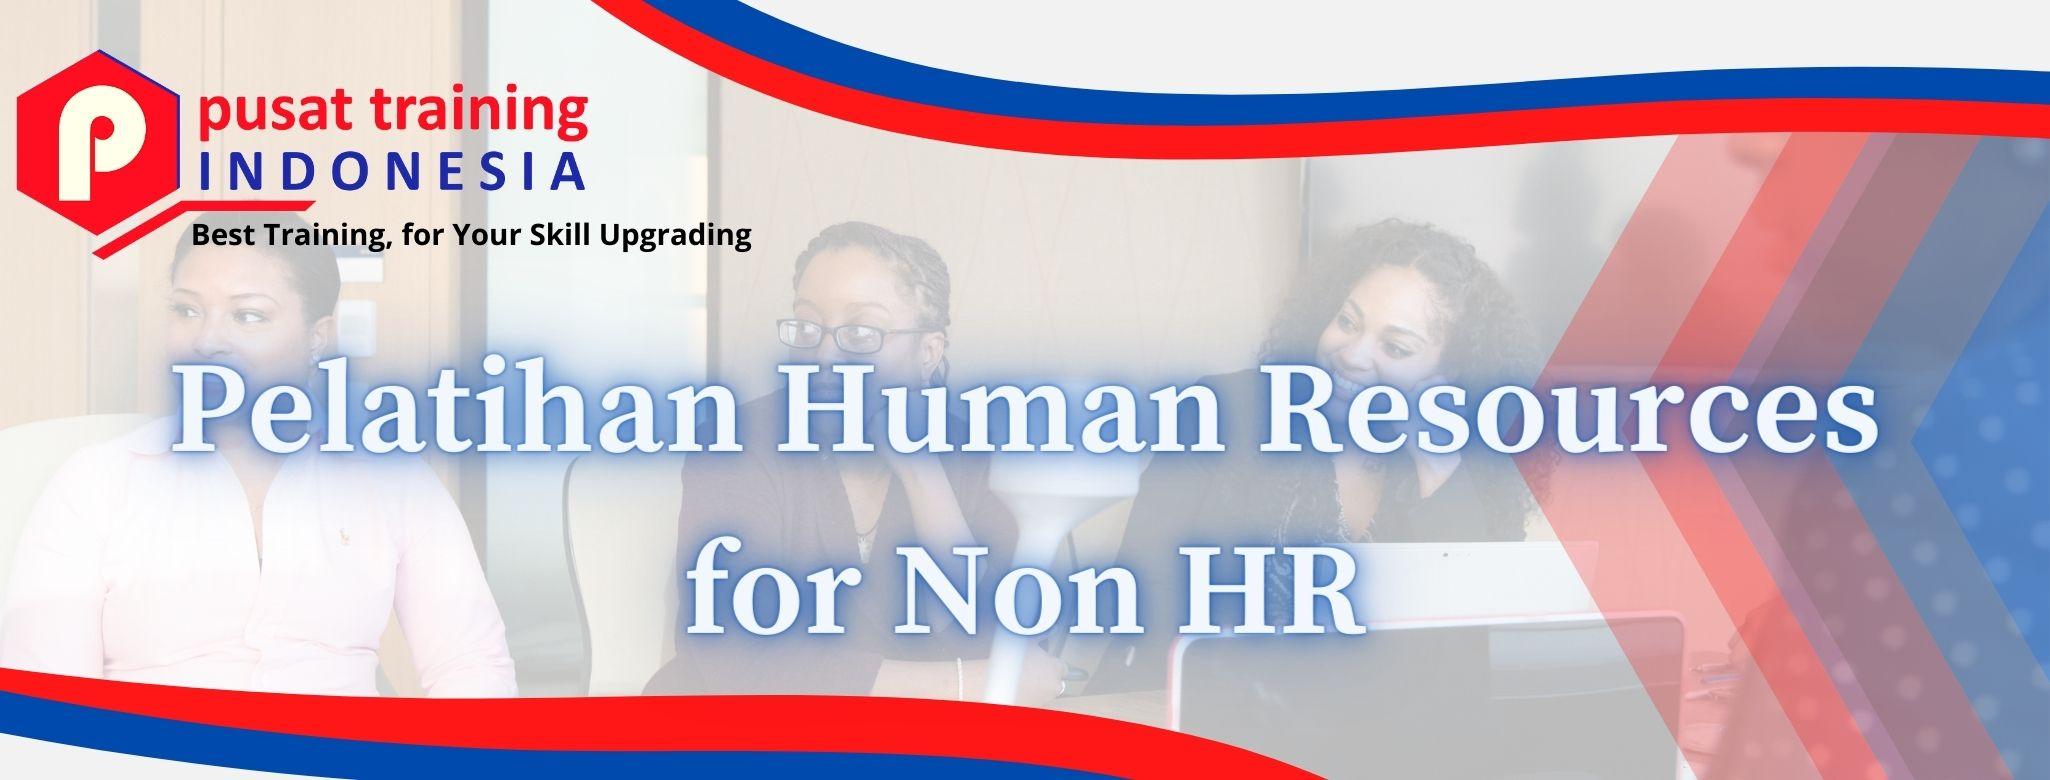 Pelatihan-Human-Resources-for-Non-HR